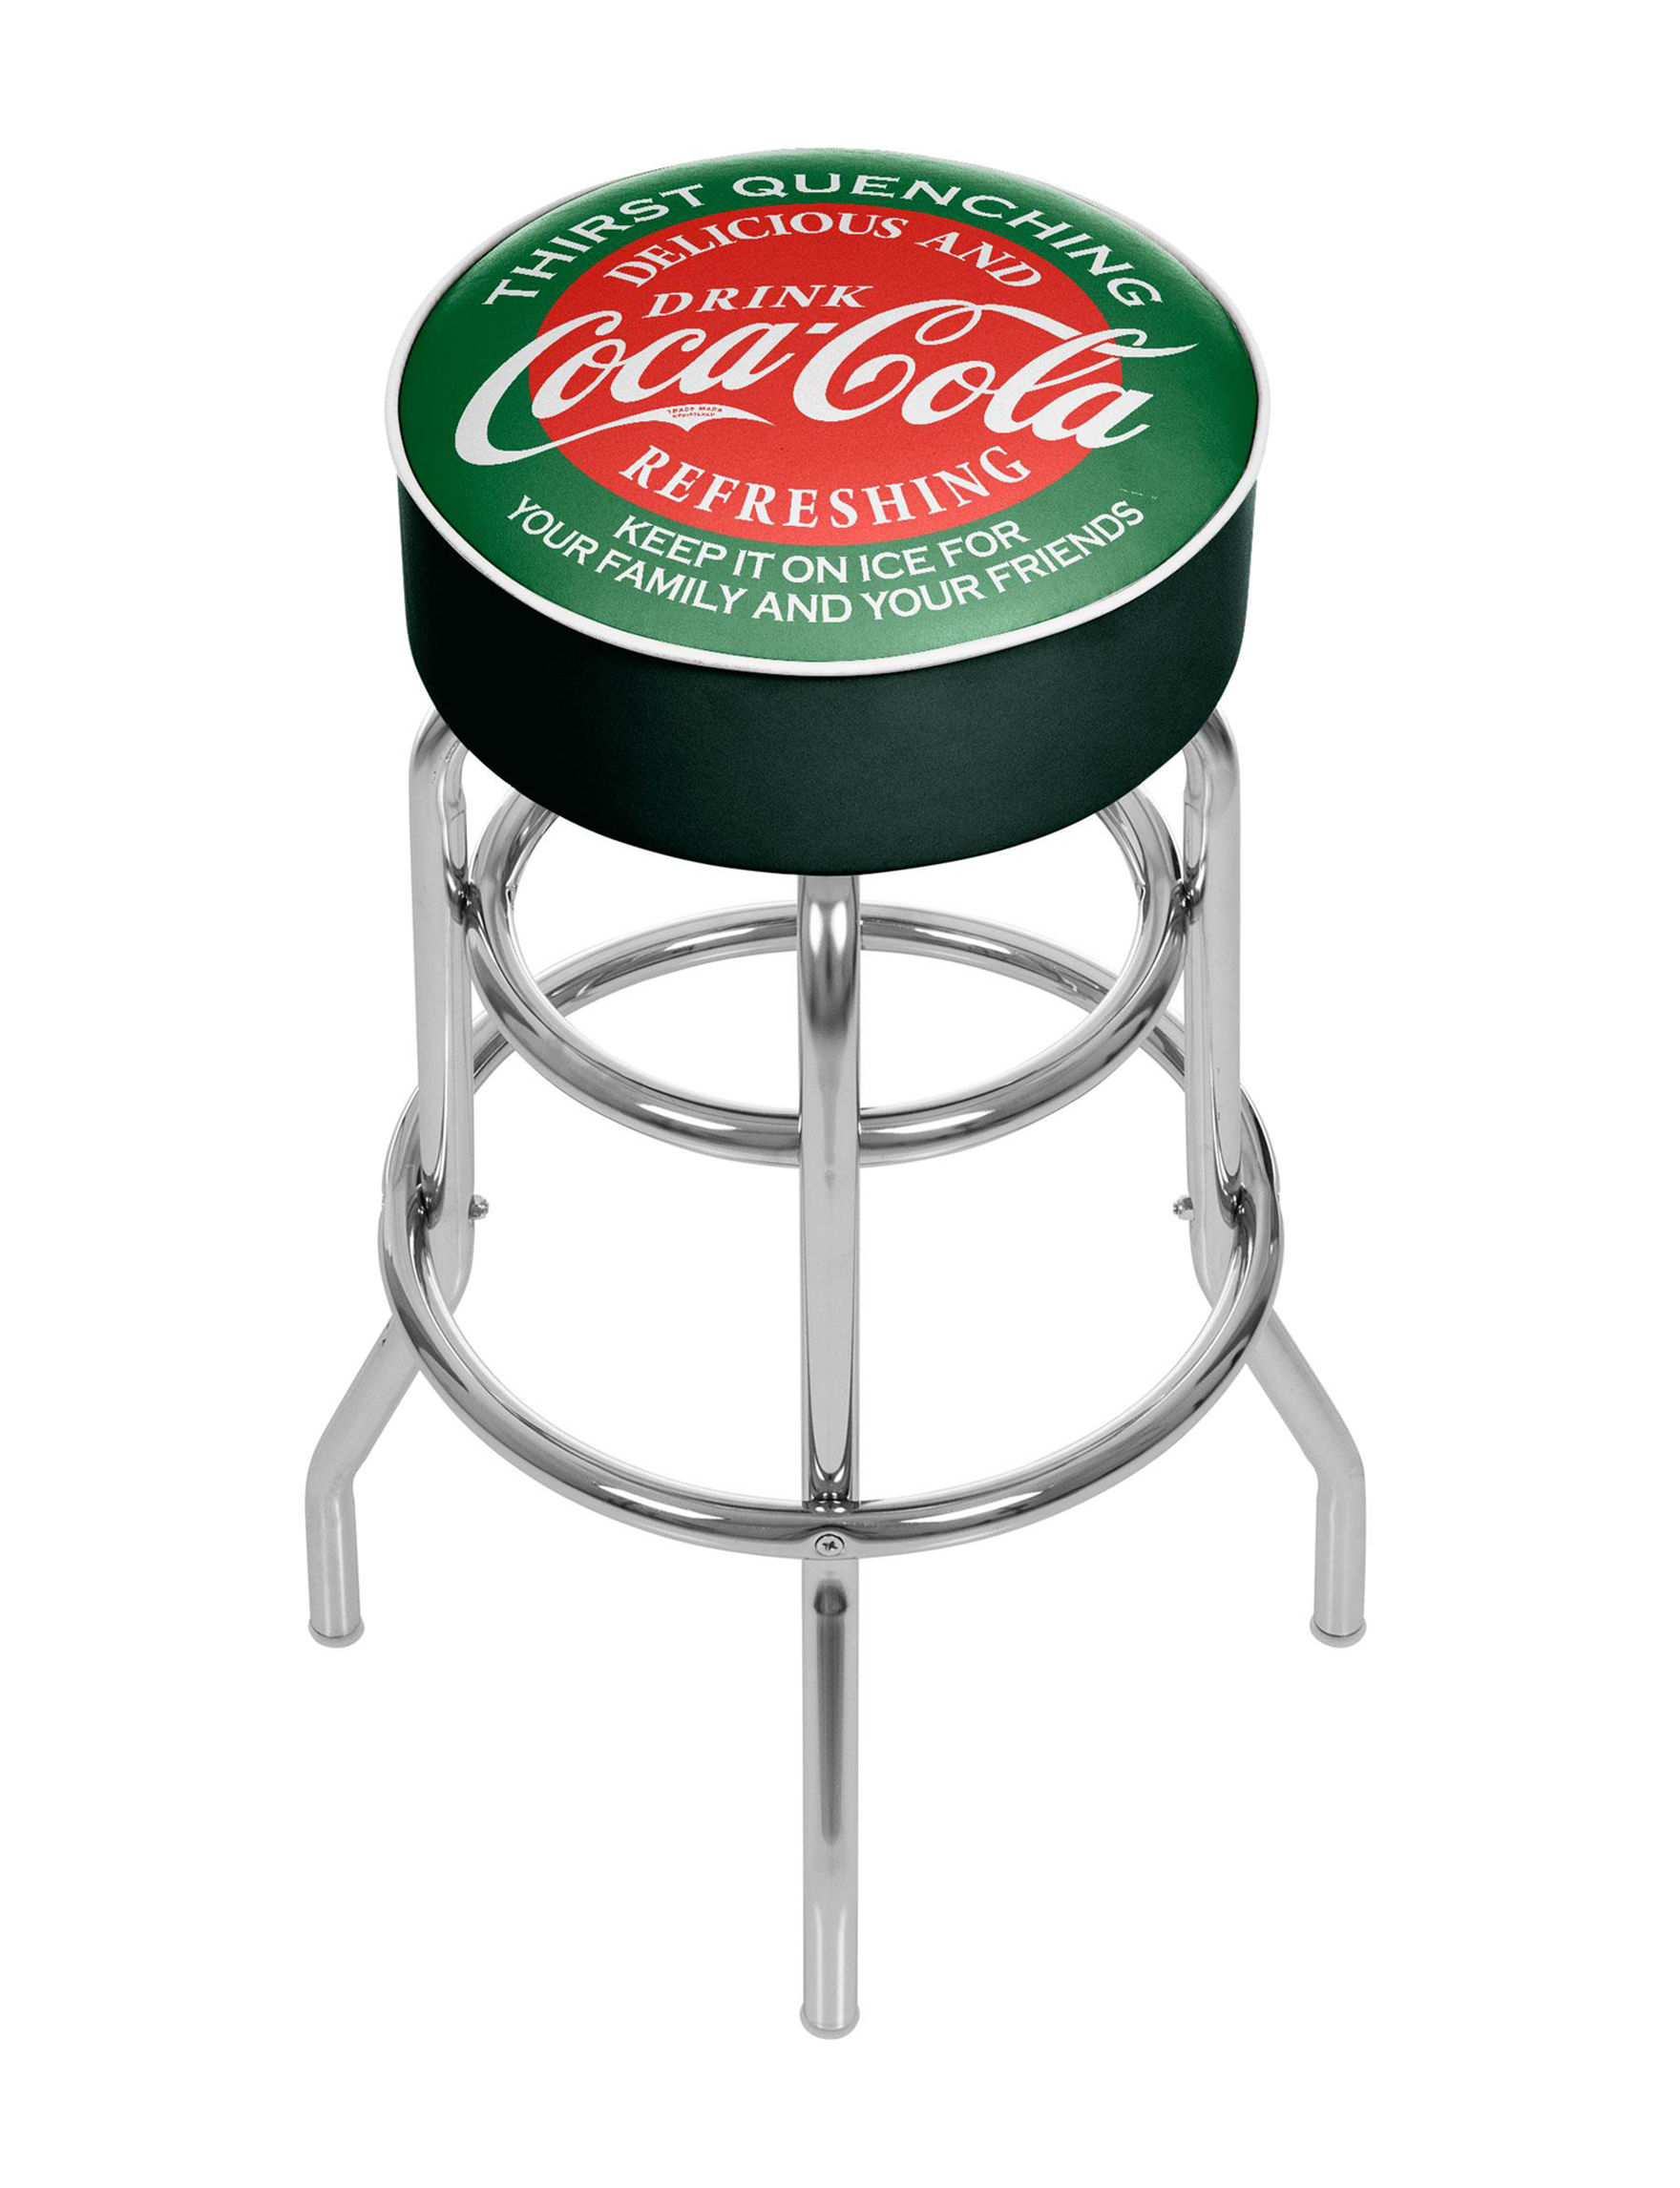 Coca Cola Green / Red Bar & Kitchen Stools Kitchen & Dining Furniture